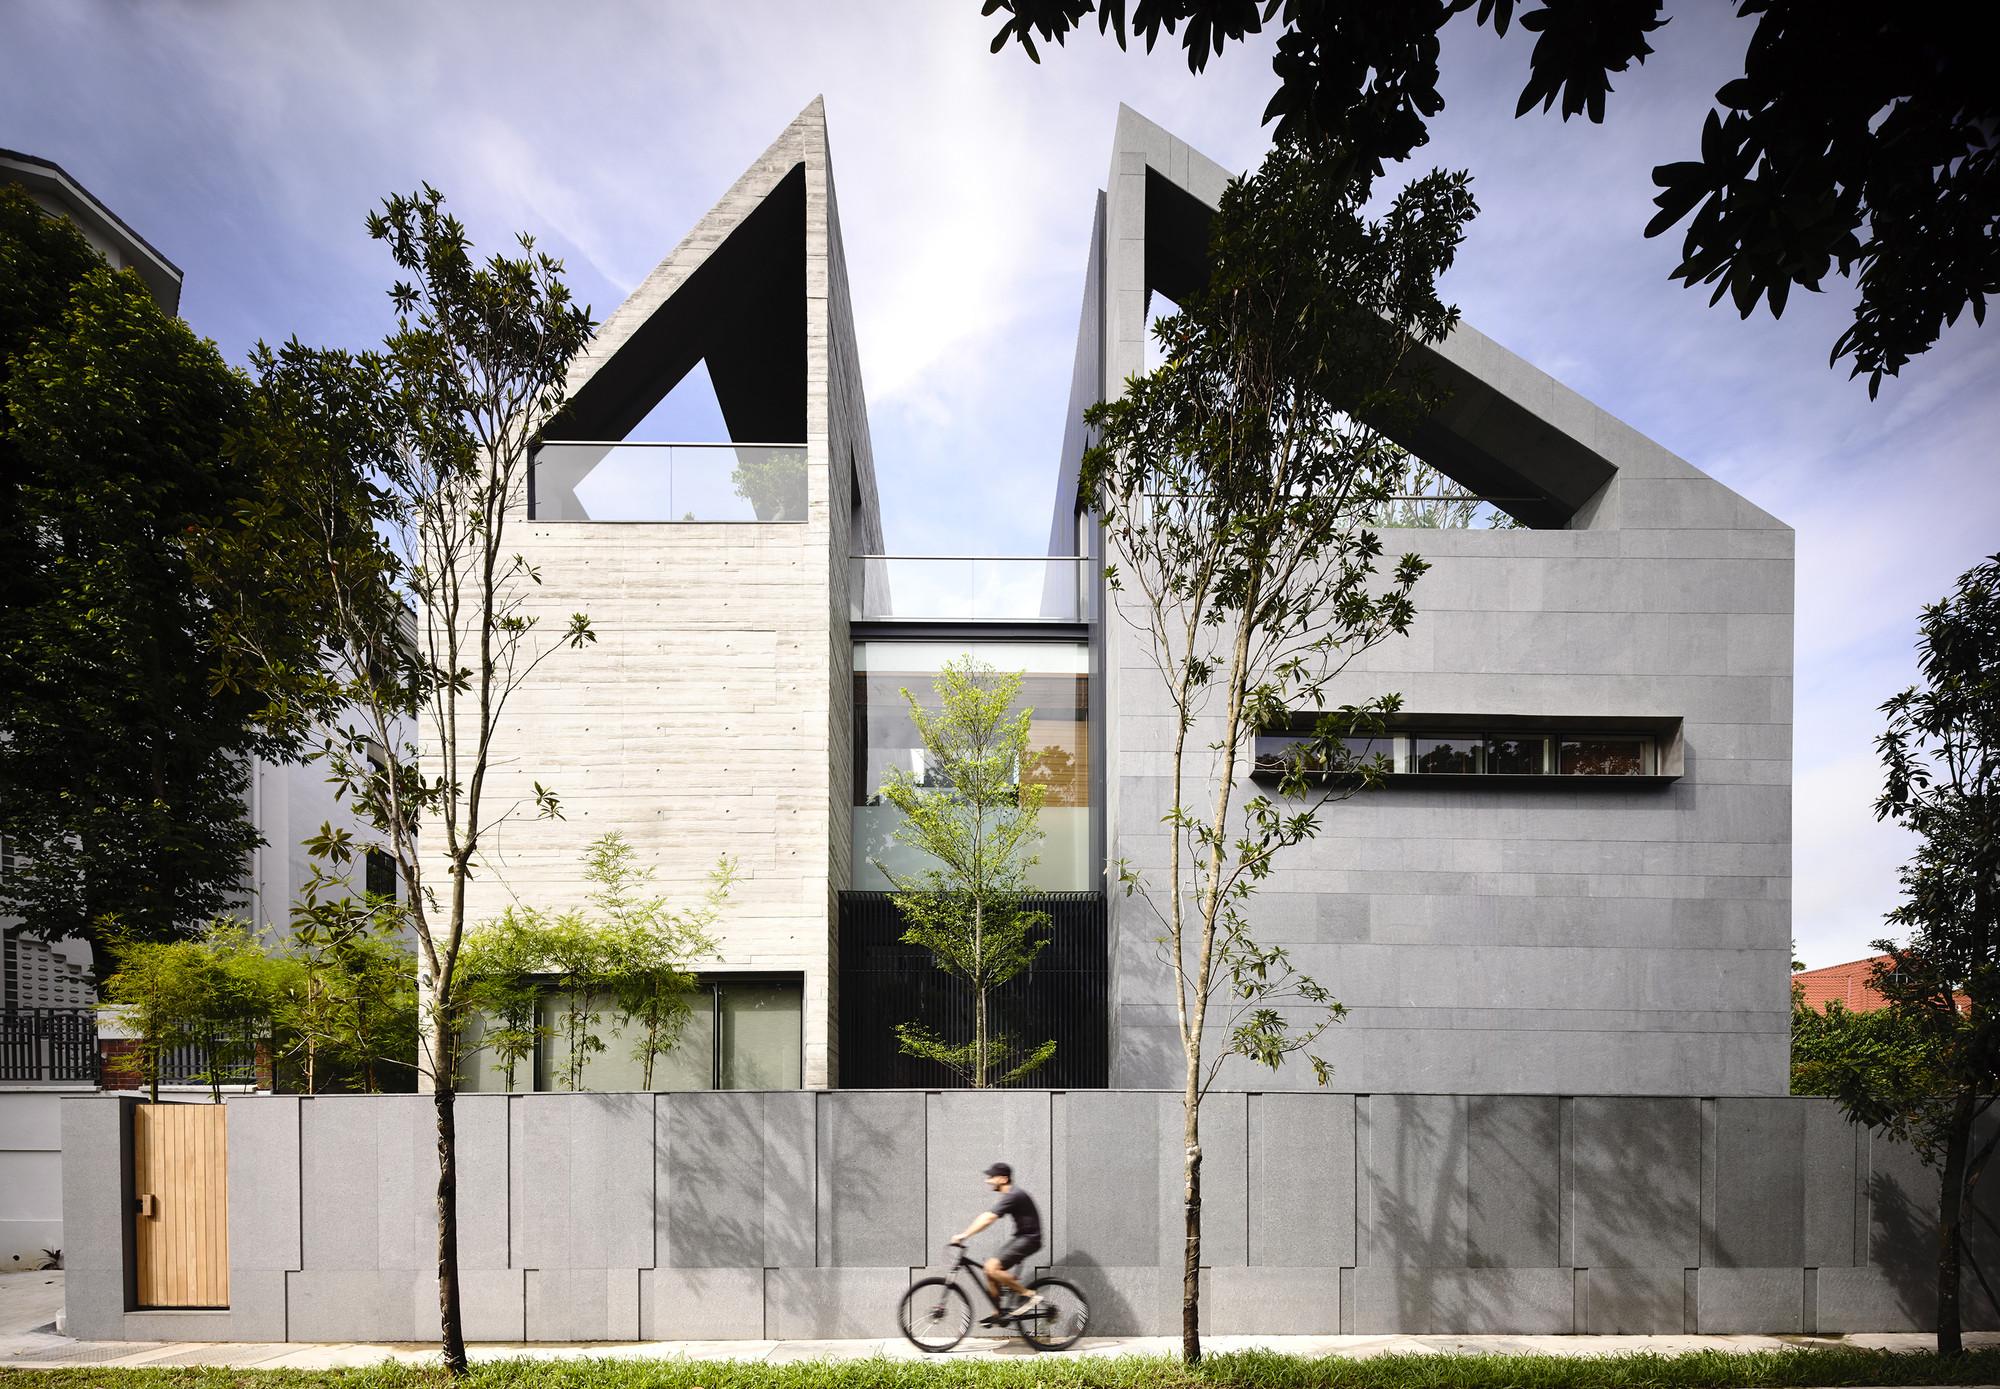 66MRN-House / ONG&ONG Pte Ltd, © Derek Swalwell